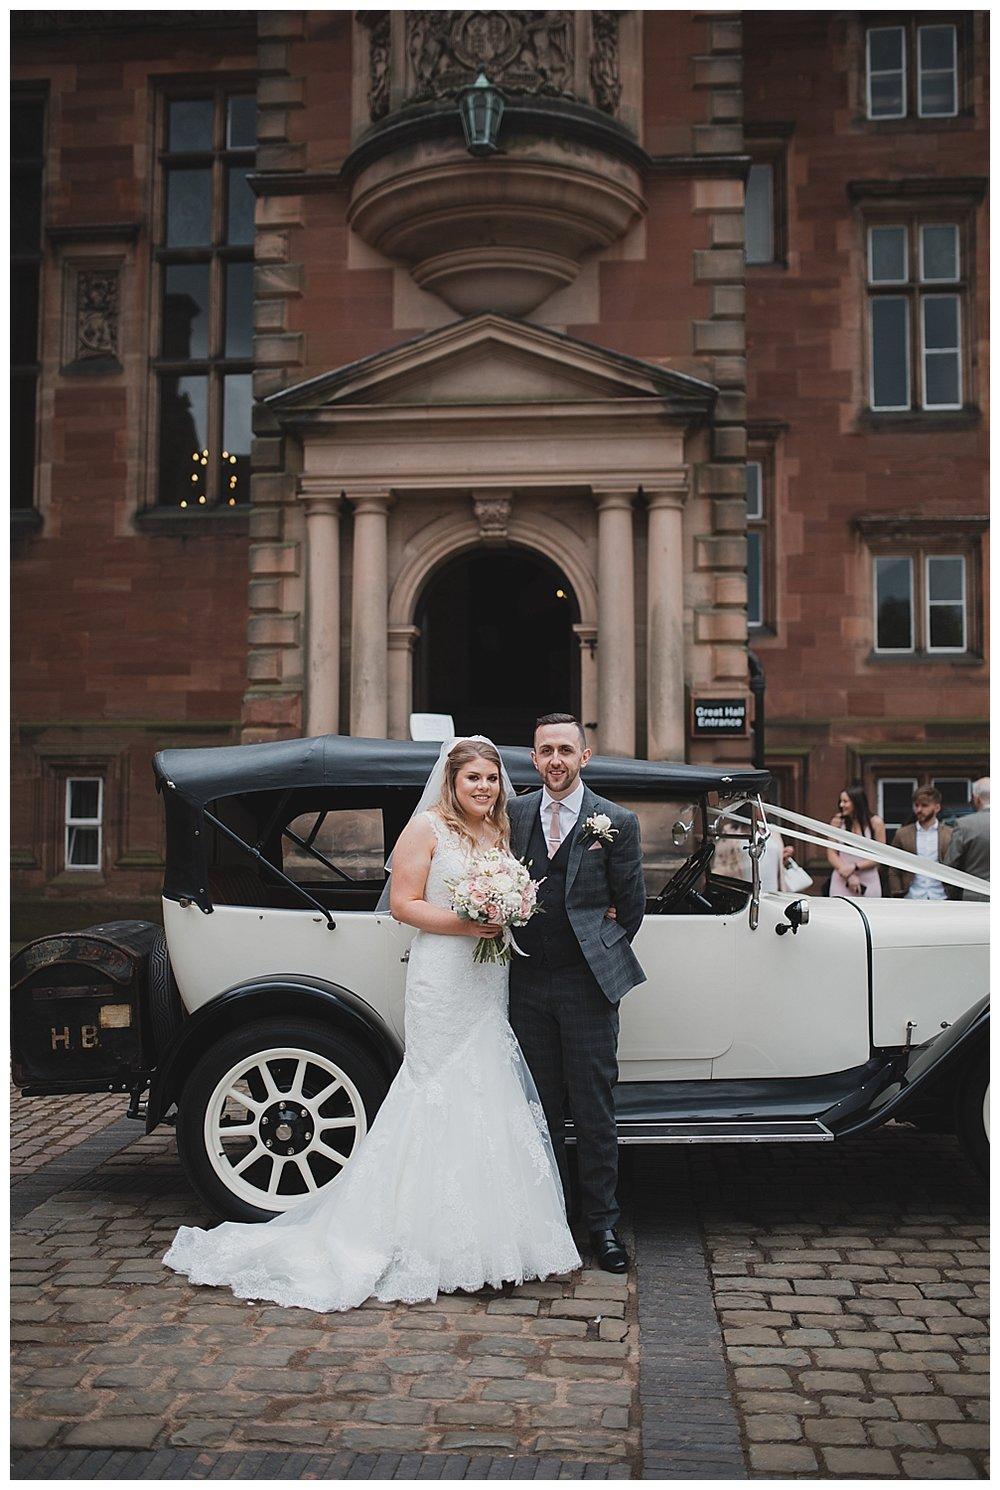 Bride and groom arrive at Keele Hall.